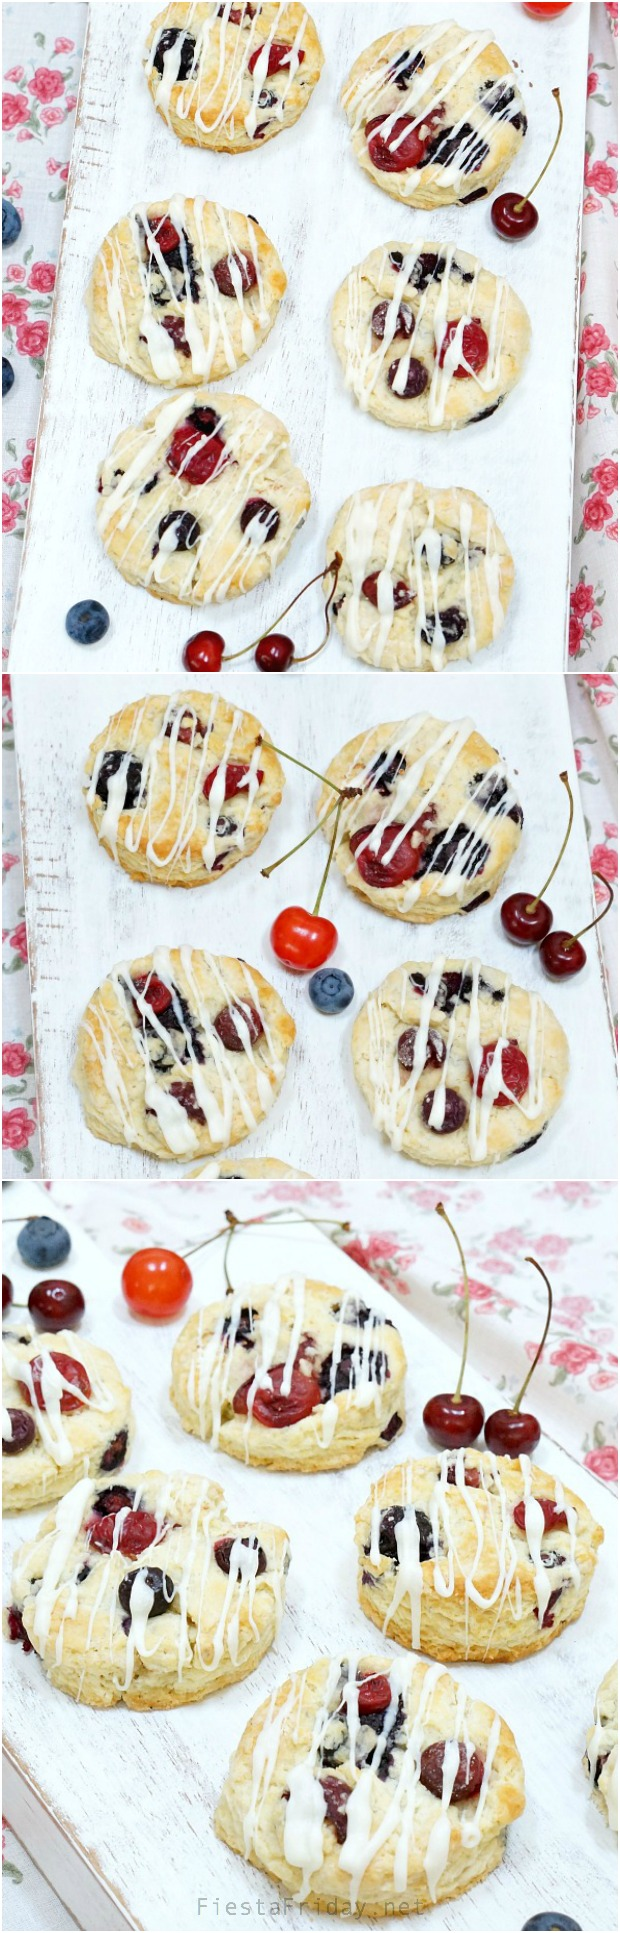 red white and blue patriotic scones | fiestafriday.net